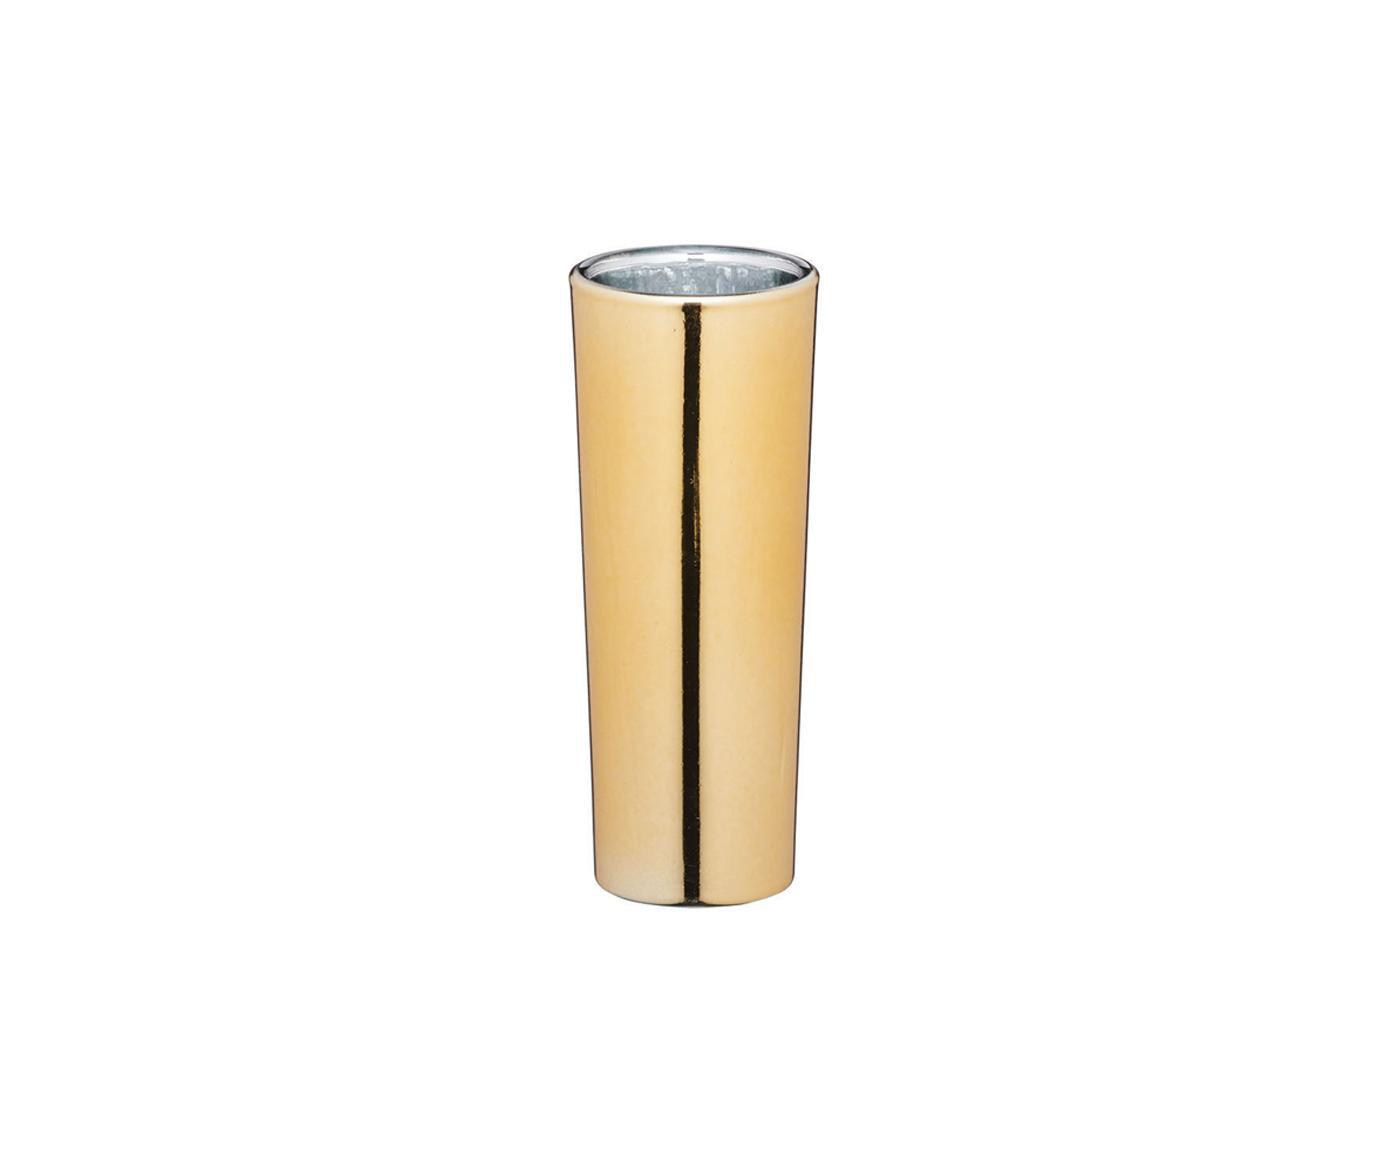 Vasos chupito Bar Craft, 4uds., Vidrio recubierto, Dorado, Ø 4 x Al 10 cm